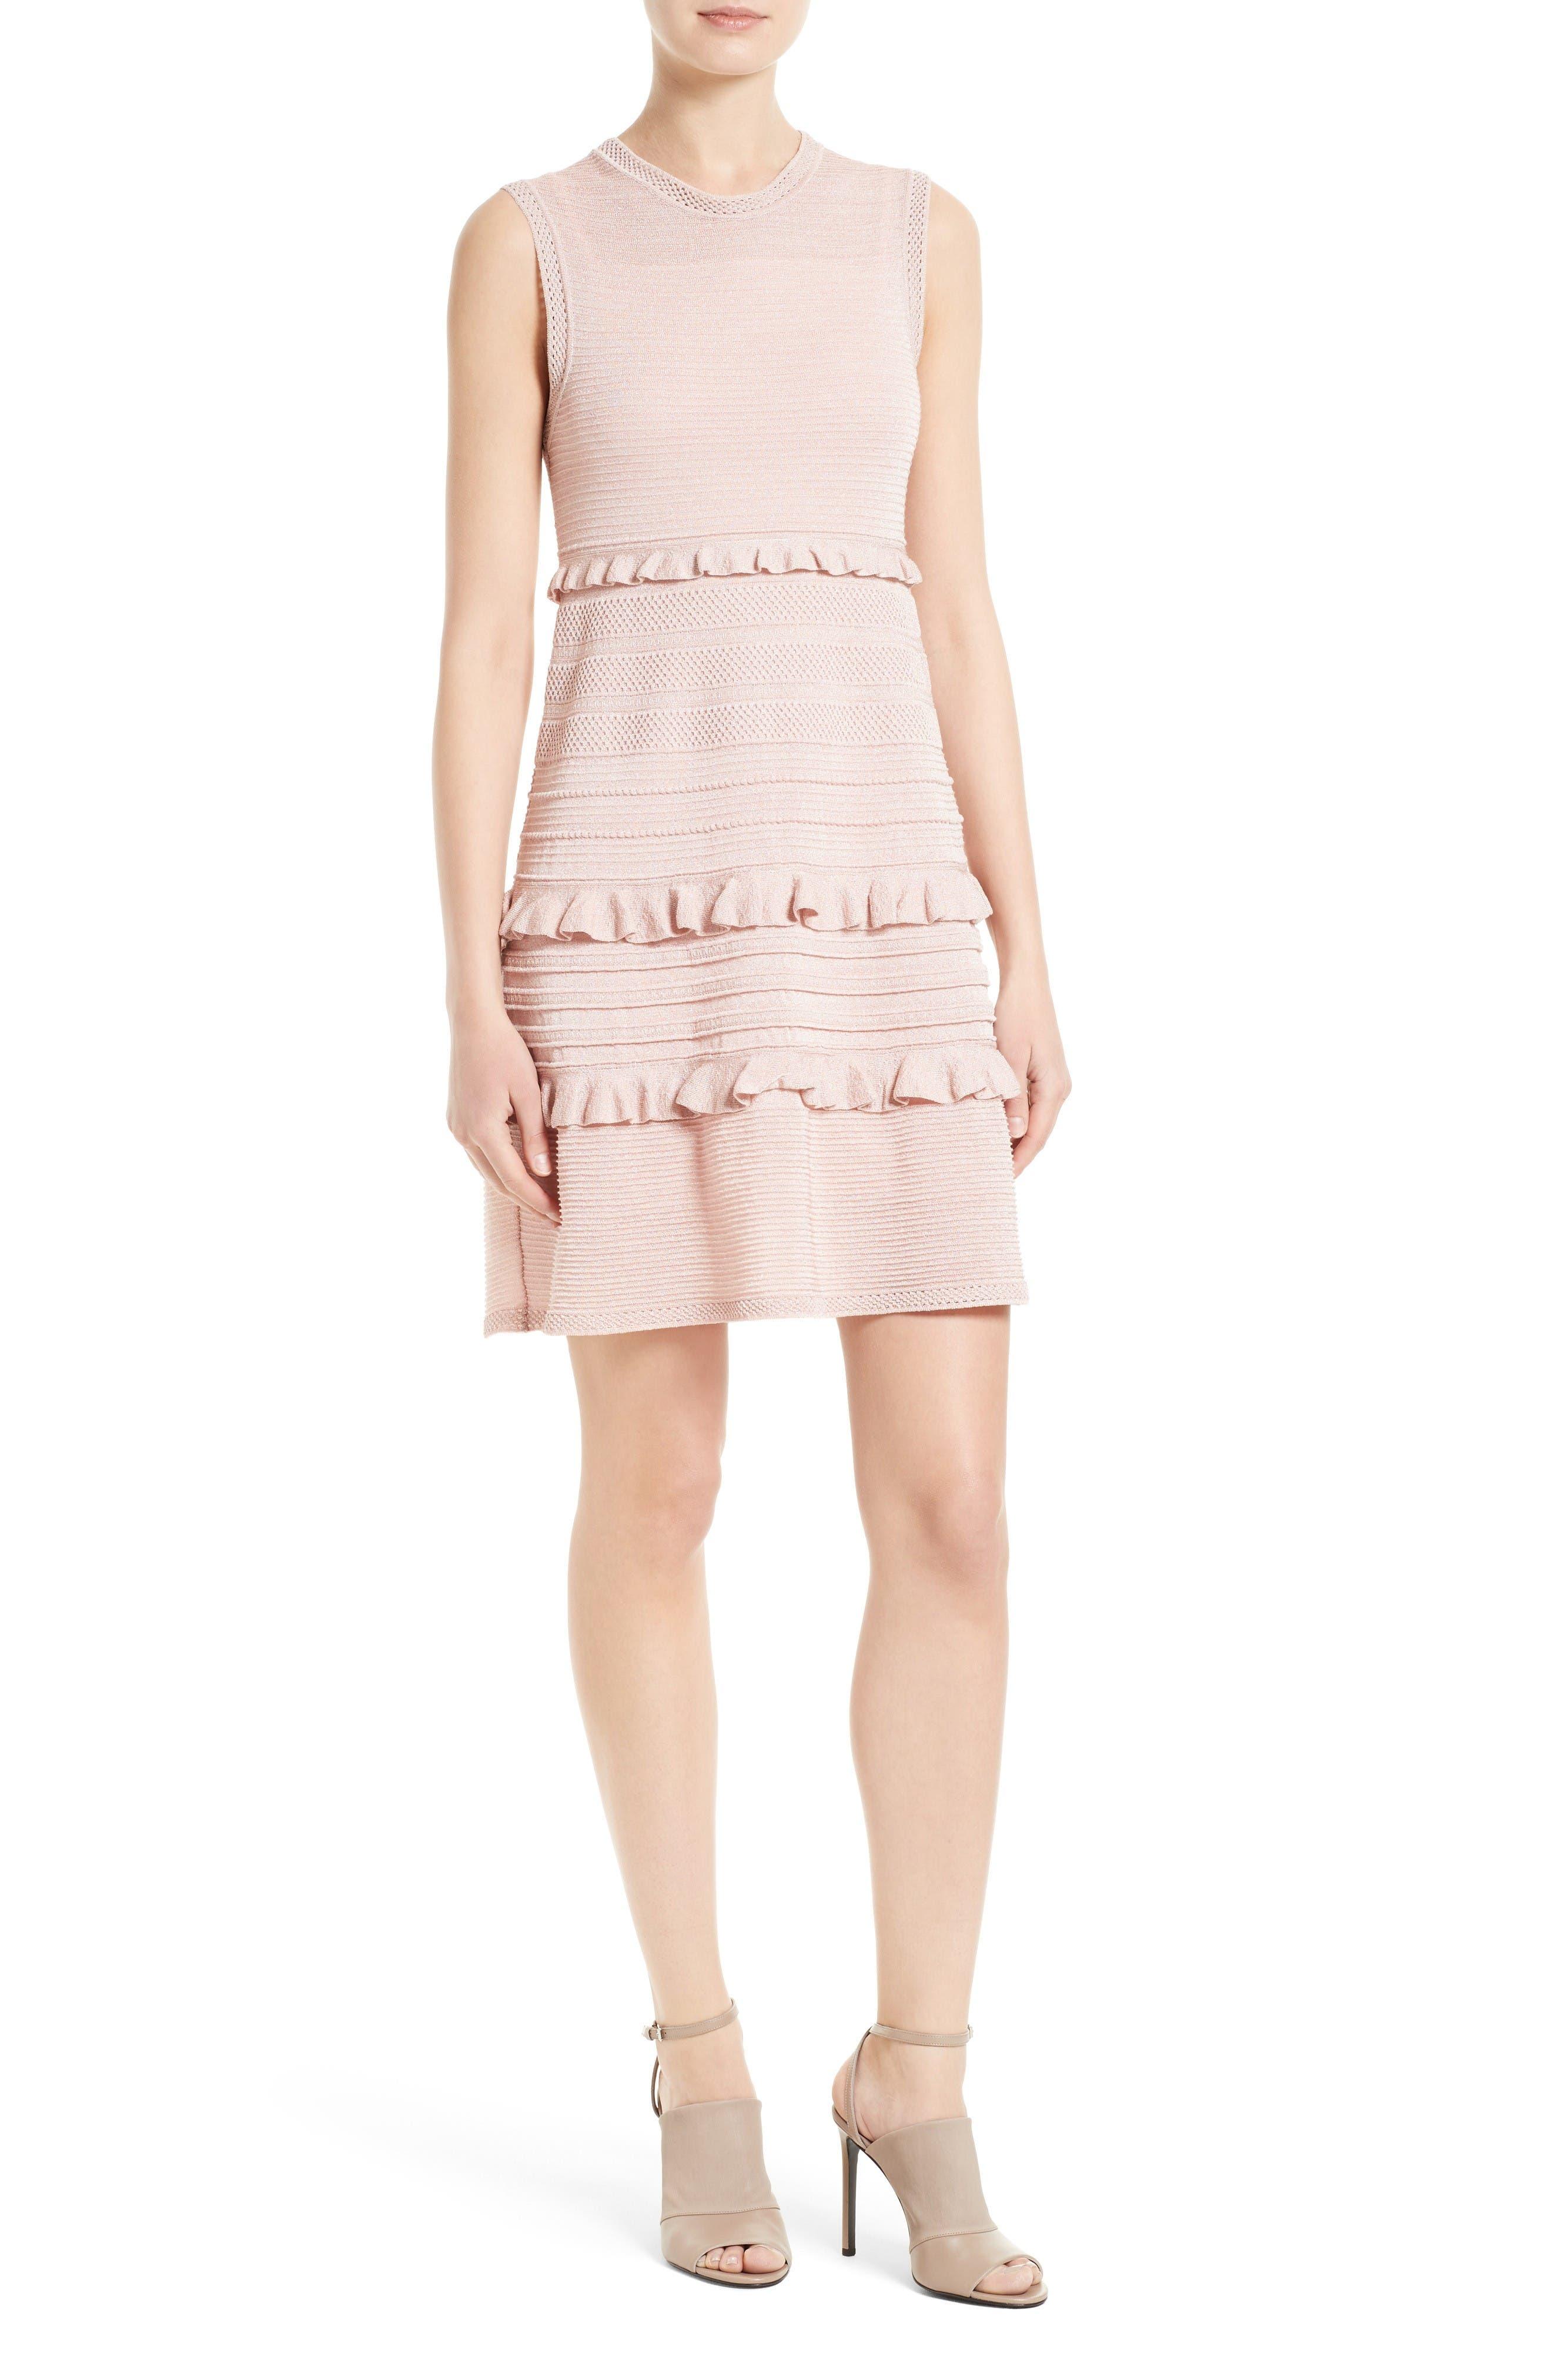 Alternate Image 1 Selected - M Missoni Ruffle Metallic Mouline Knit Dress